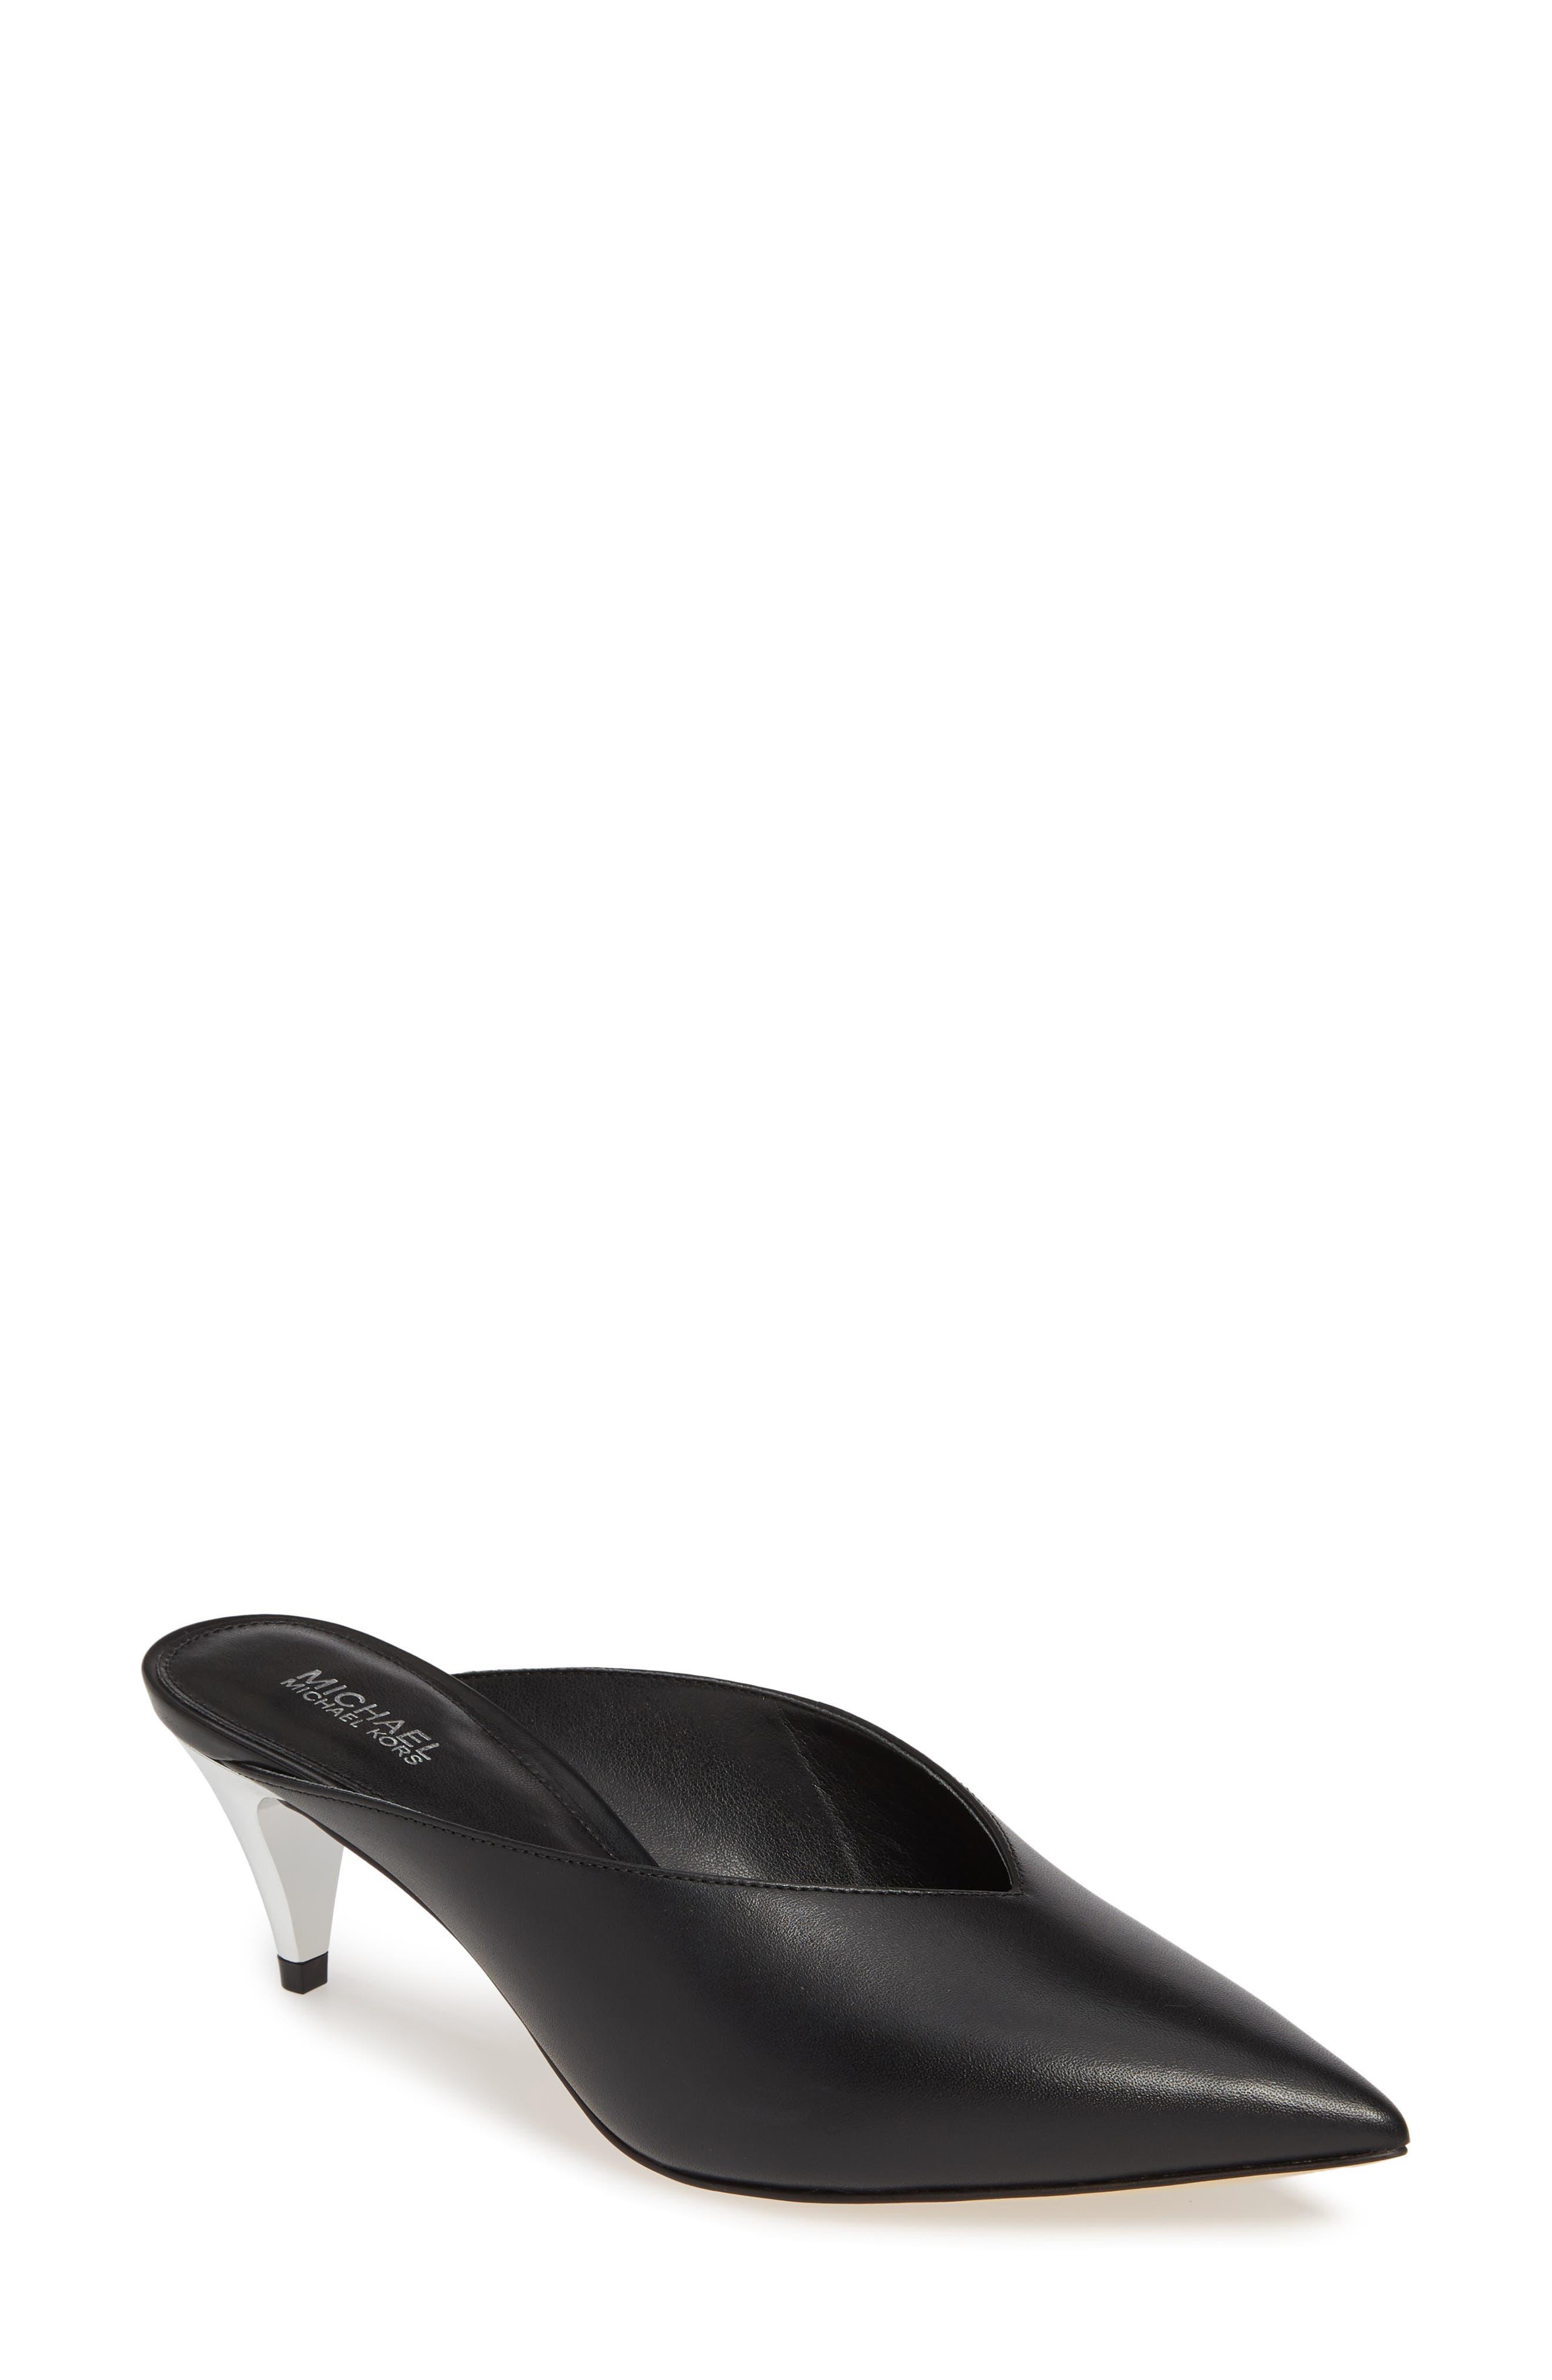 Michael Michael Kors Cambria Mule, Black